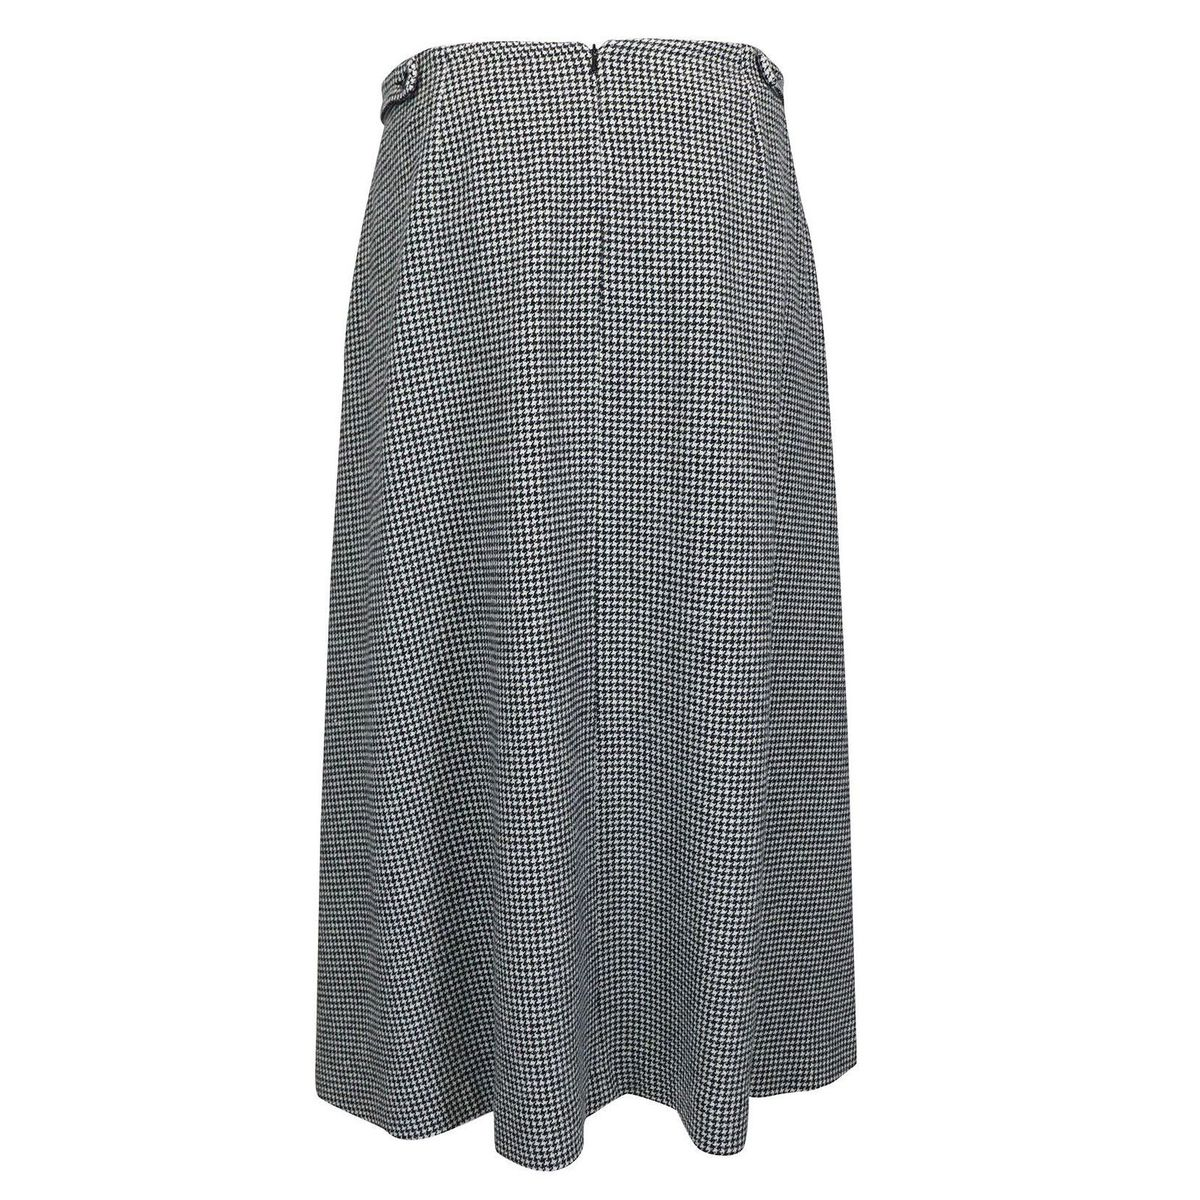 Tania wool blend skirt Black white Max Mara